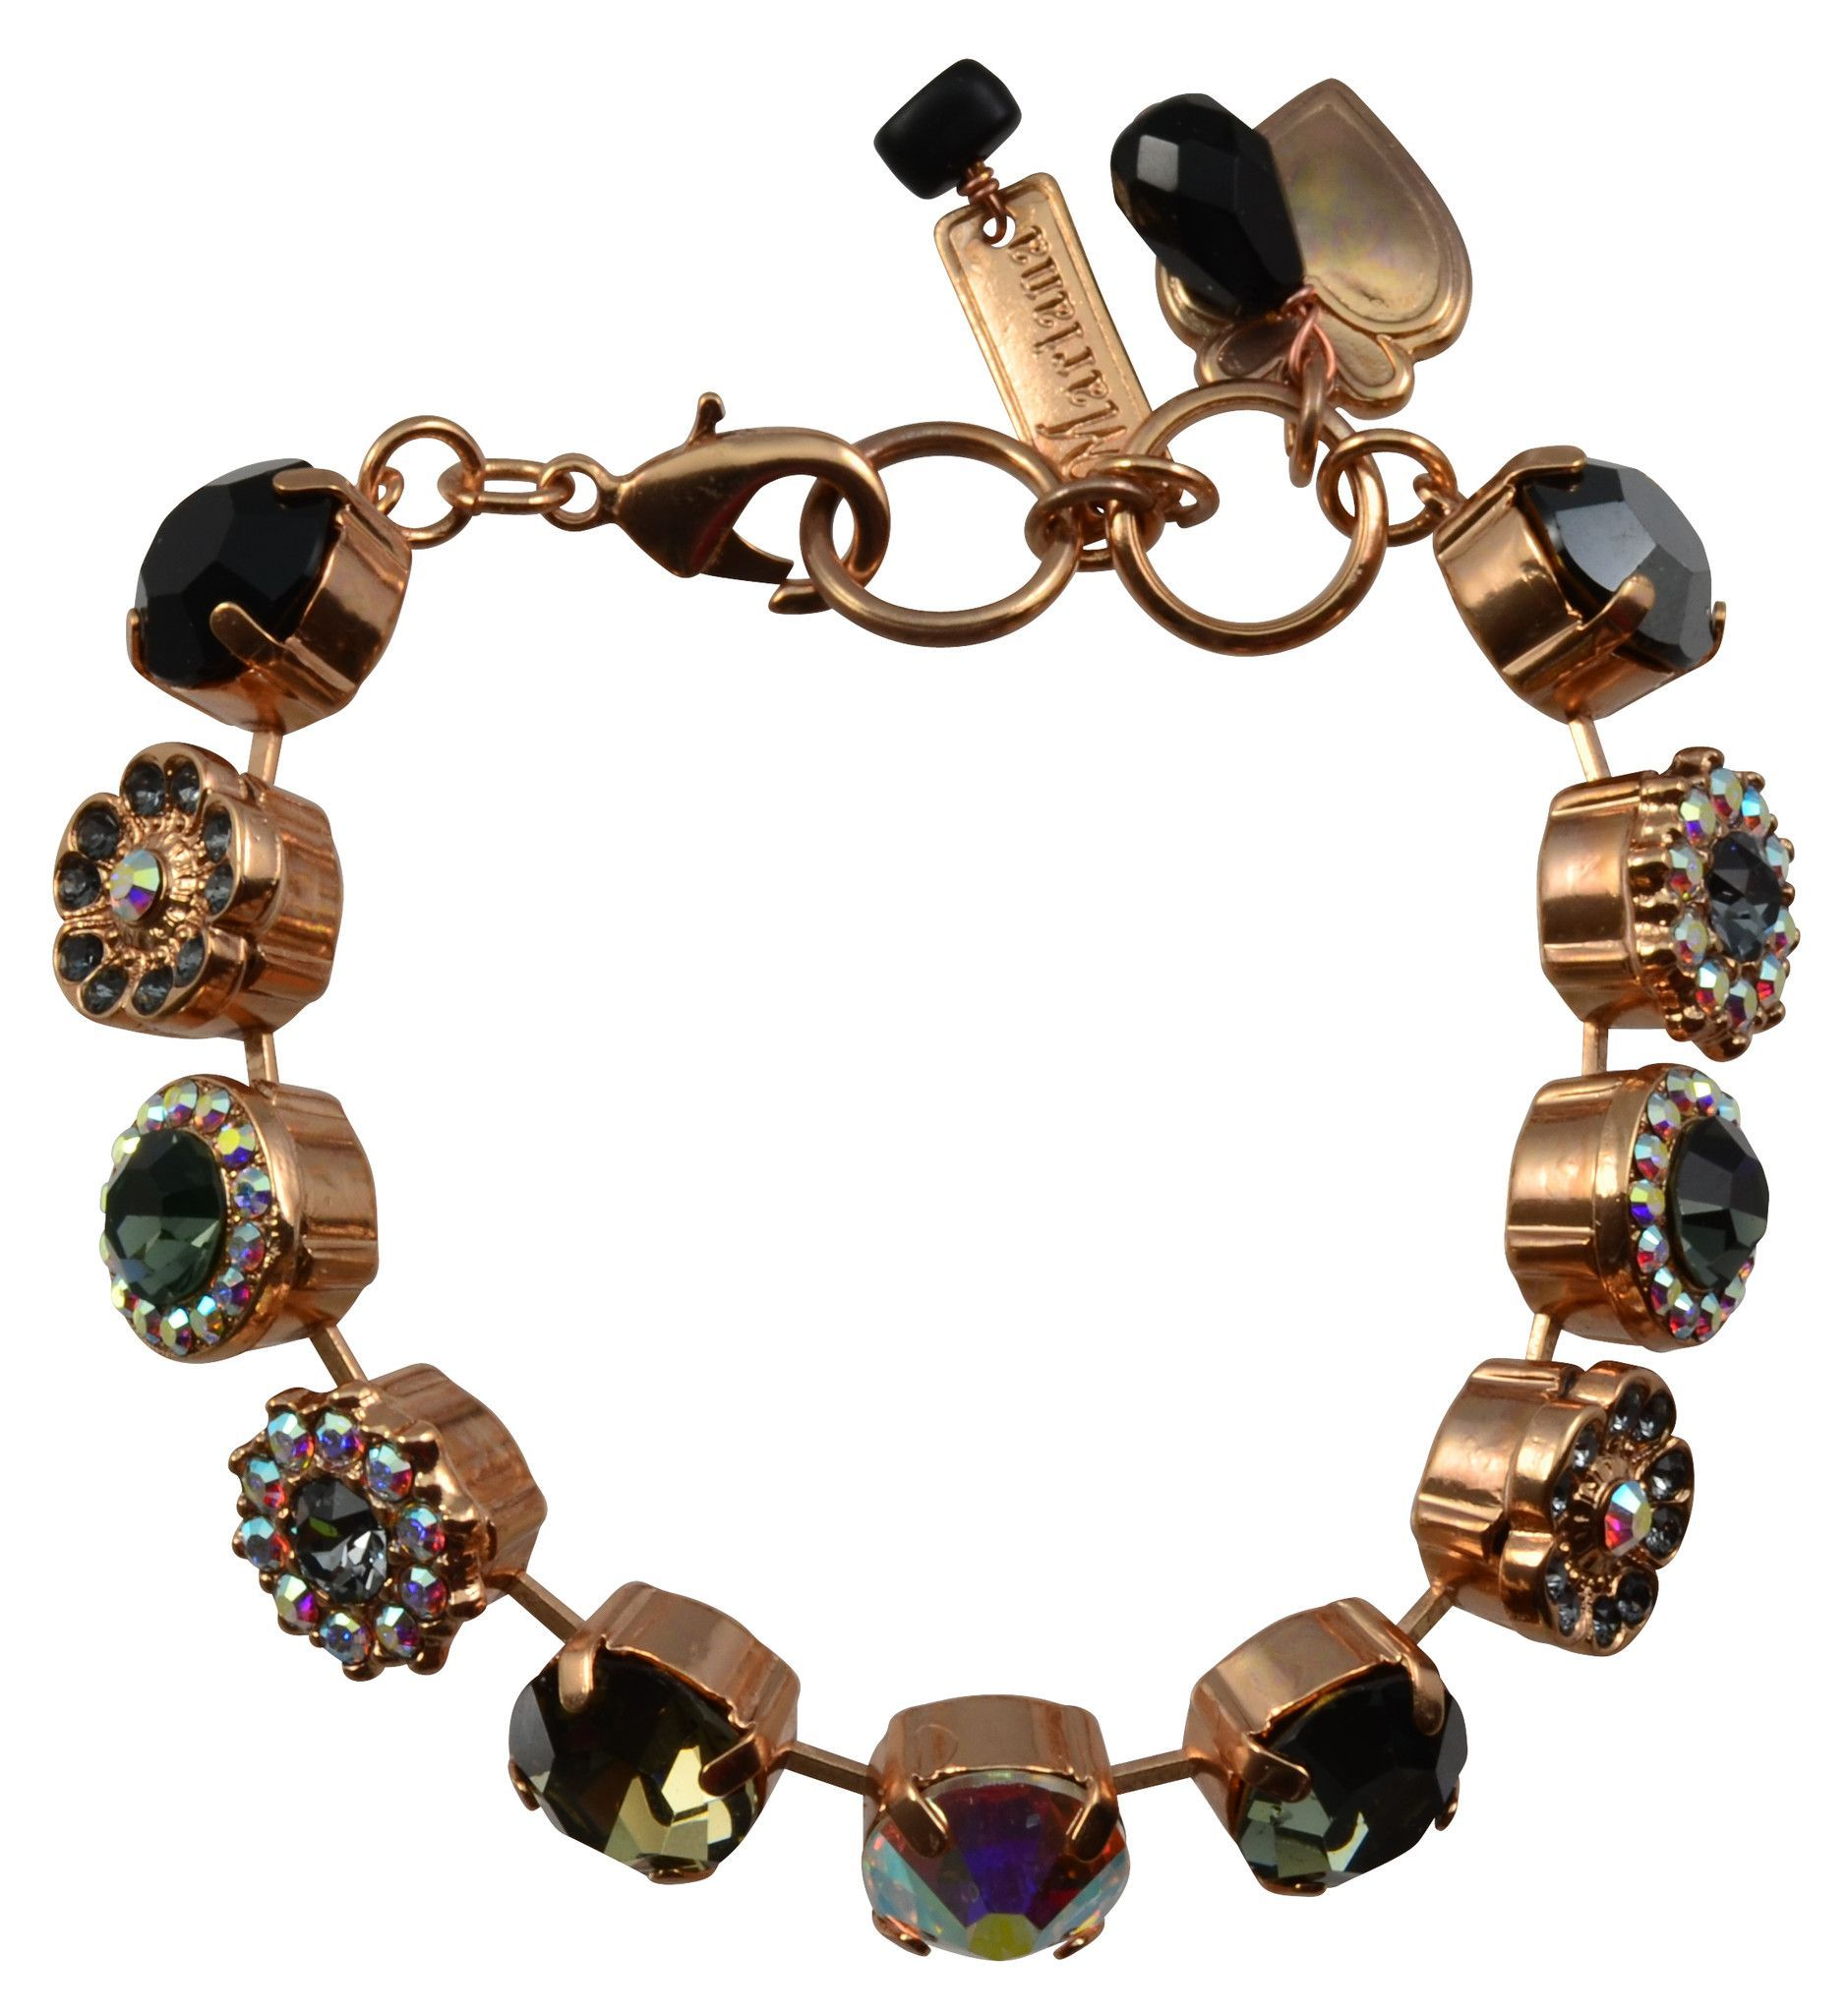 Mariana tuxedo rose gold plated swarovski crystal tennis bracelet